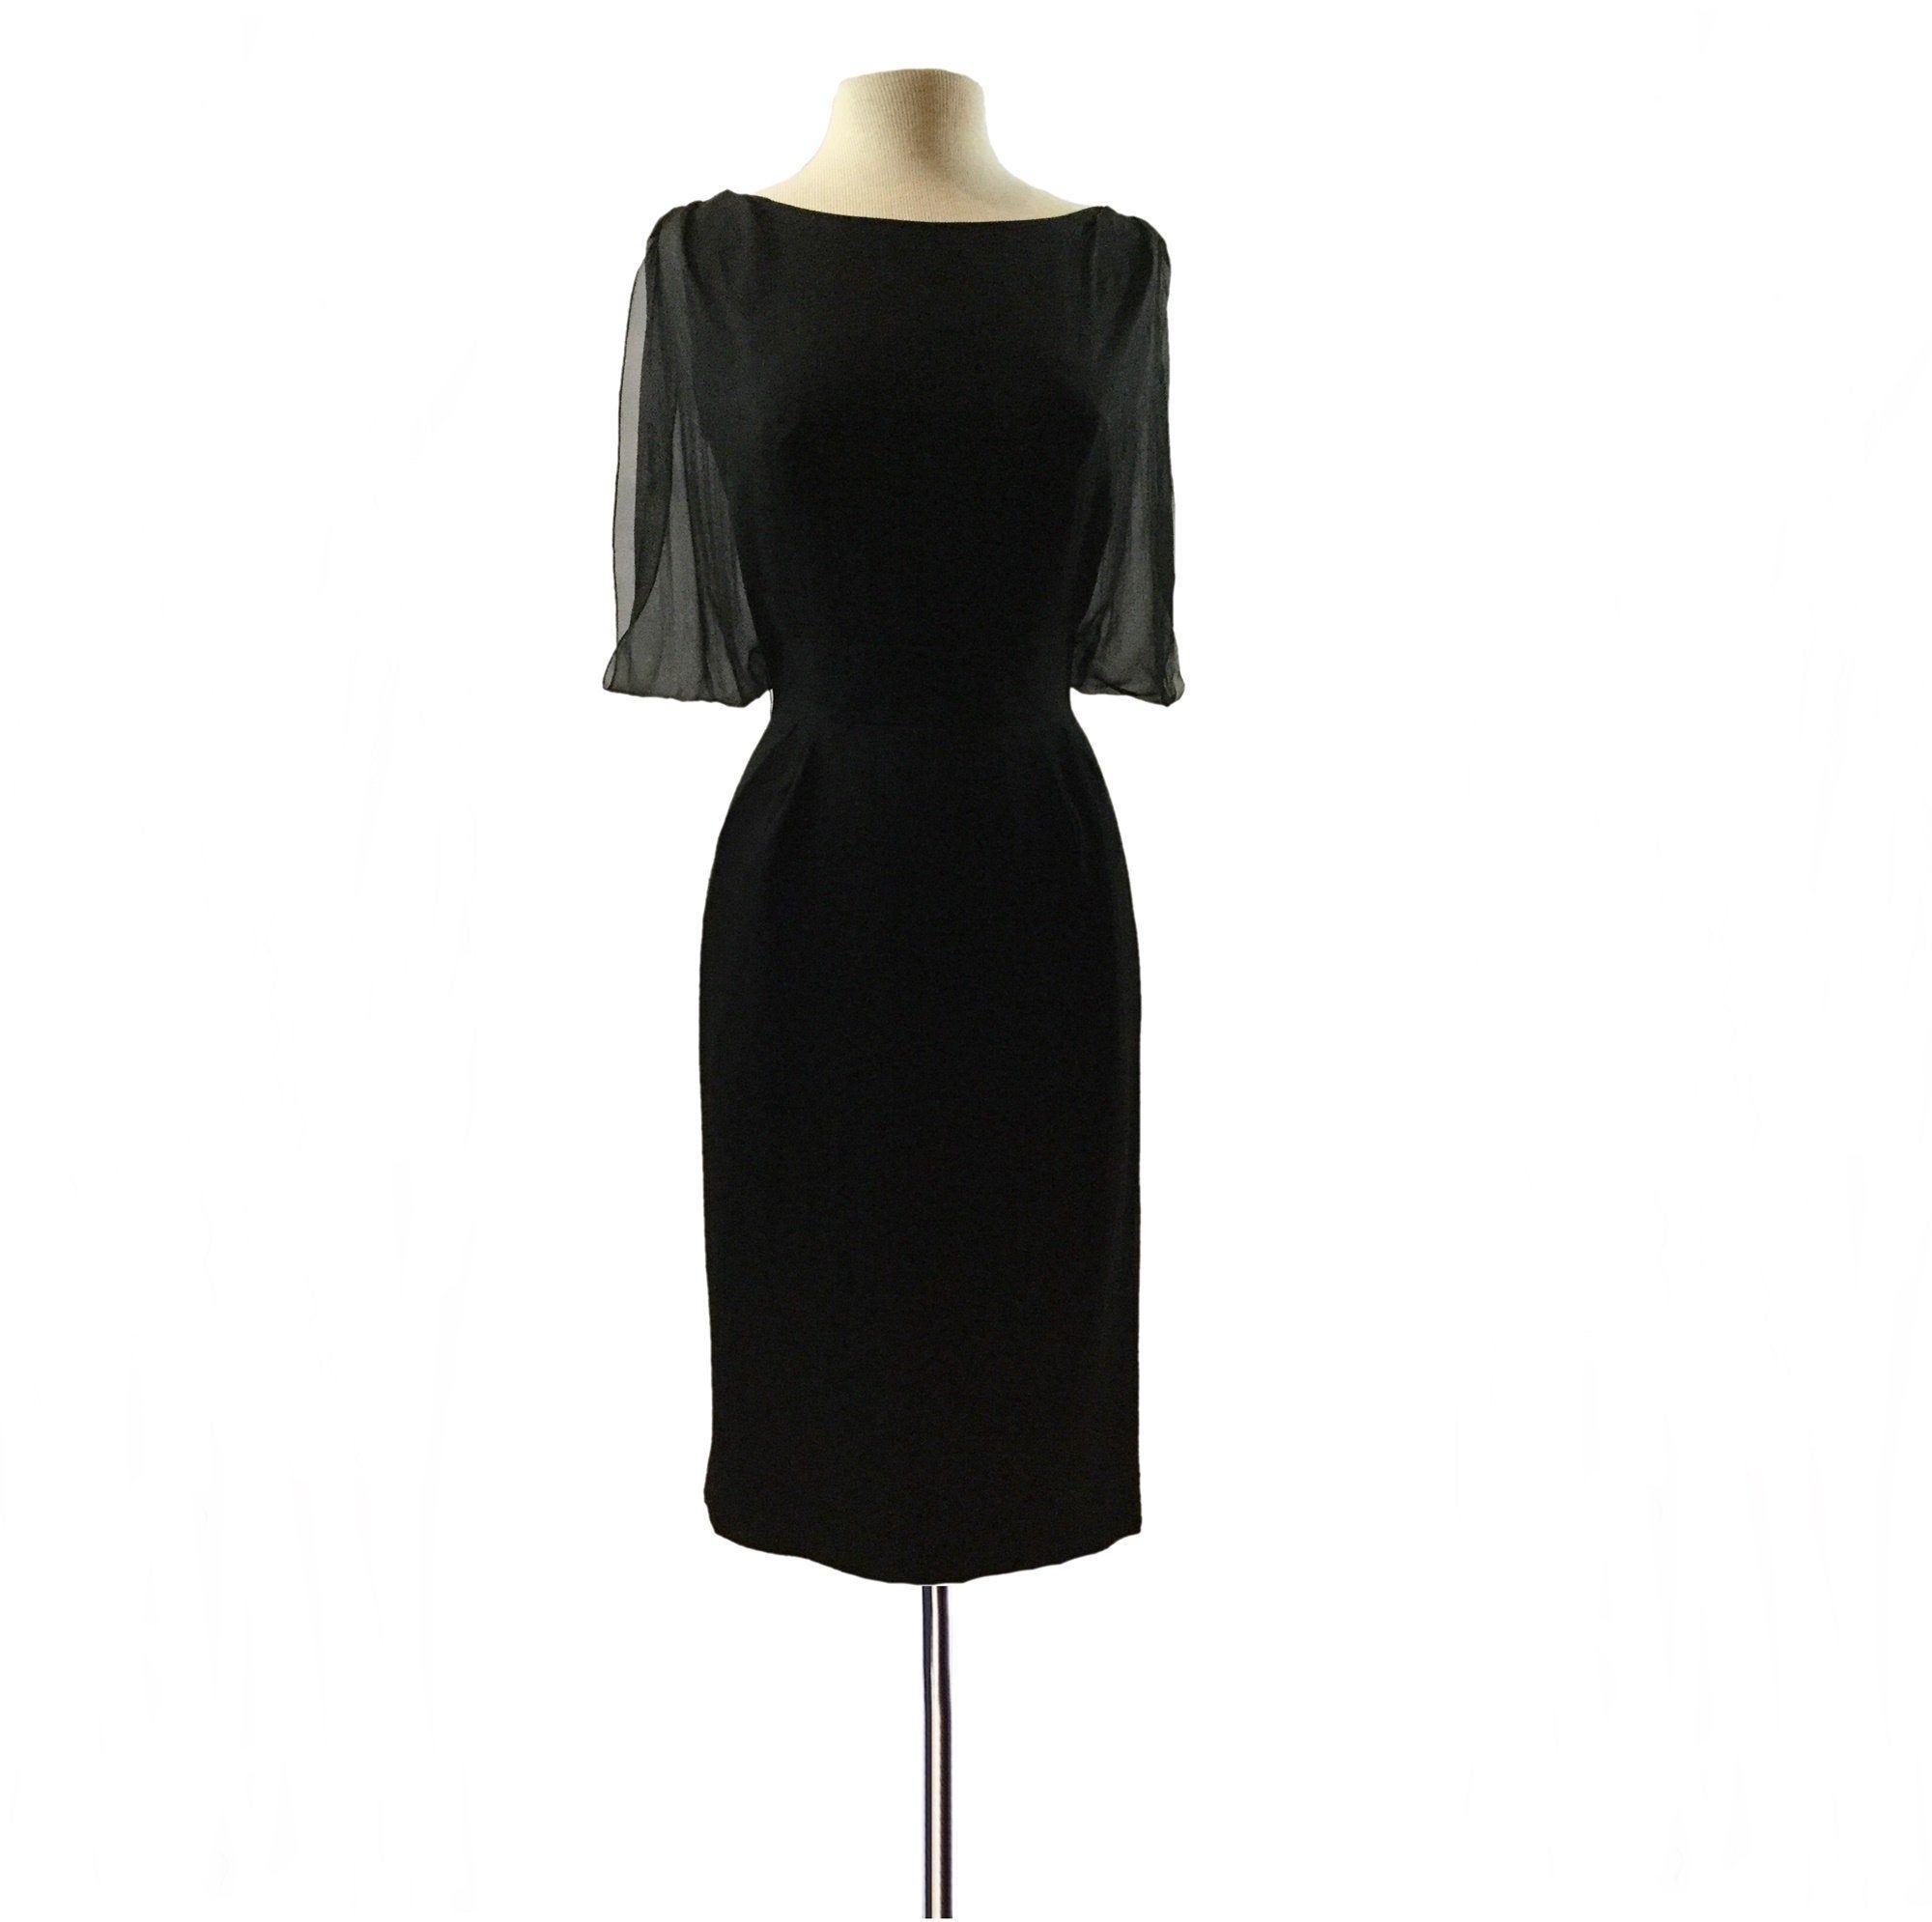 Vintage 60s Lilli Diamond Black Chiffon Cocktail Dress Lbd Etsy Black Chiffon Cocktail Dress Chiffon Cocktail Dress Perfect Little Black Dress [ 1990 x 2000 Pixel ]